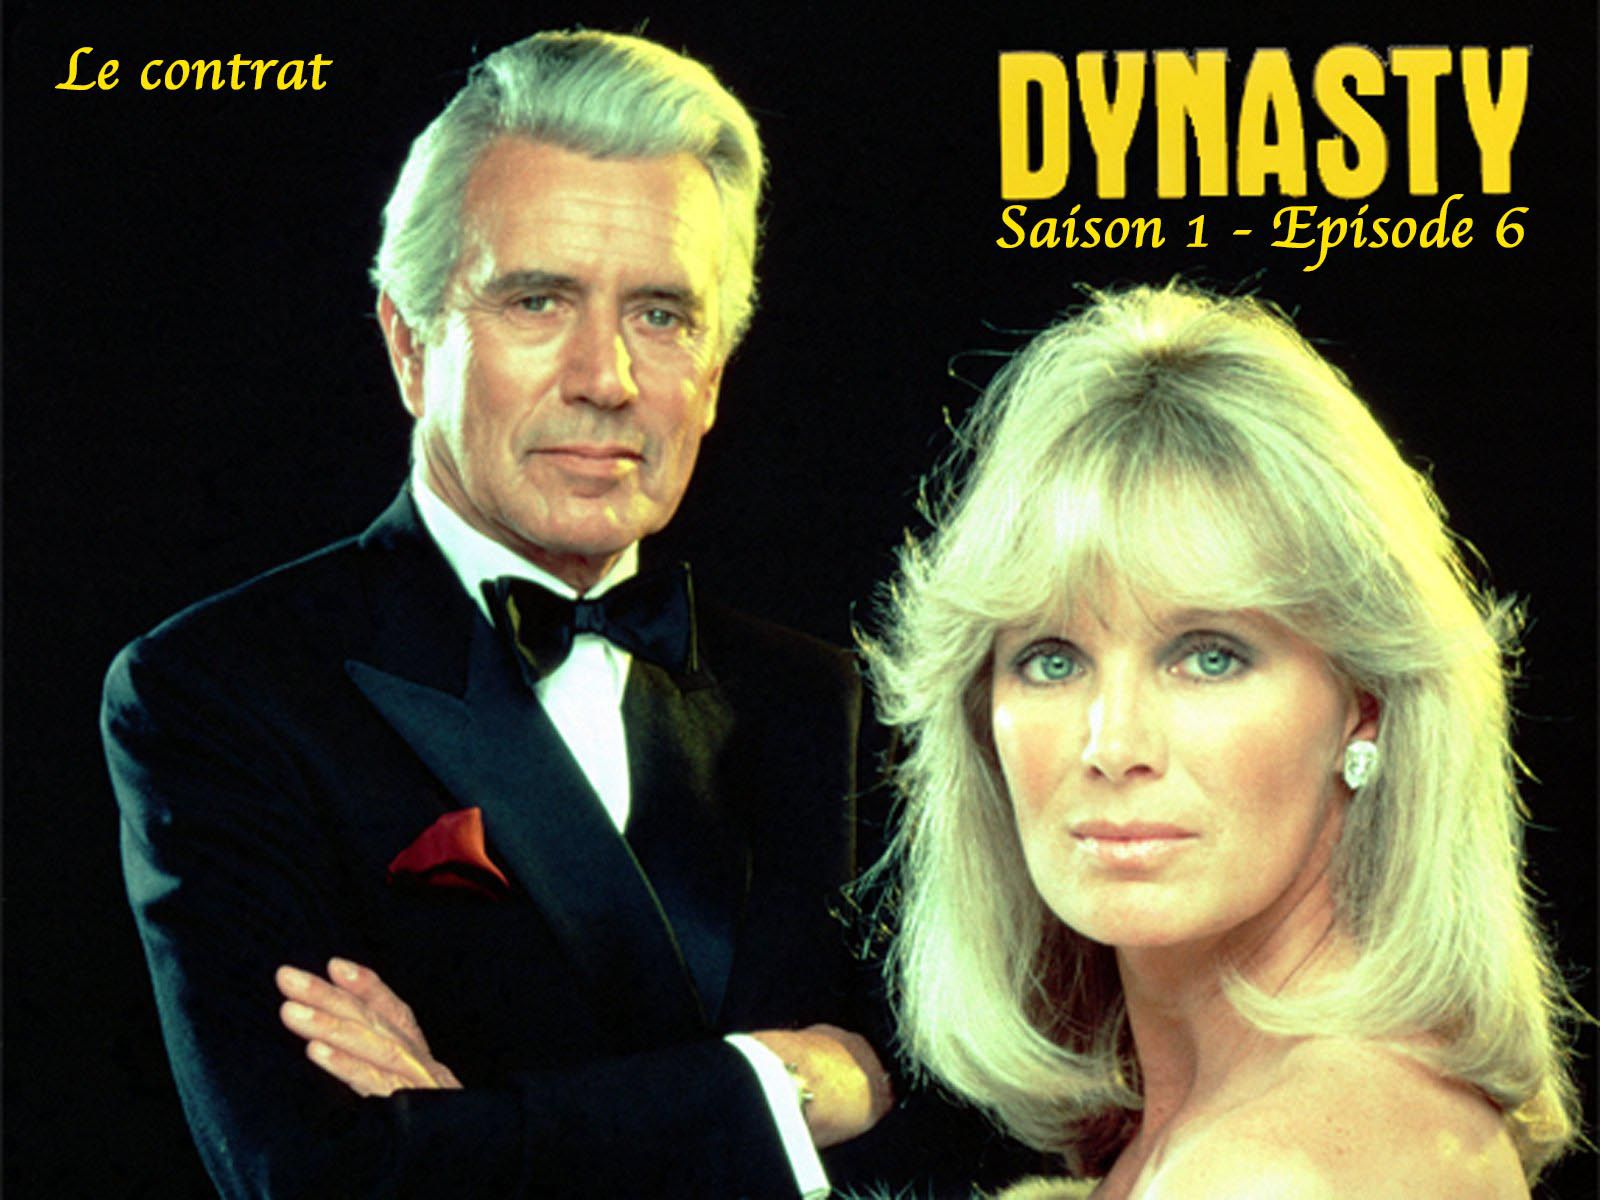 DYNASTIE - Saison 1 Episode 06